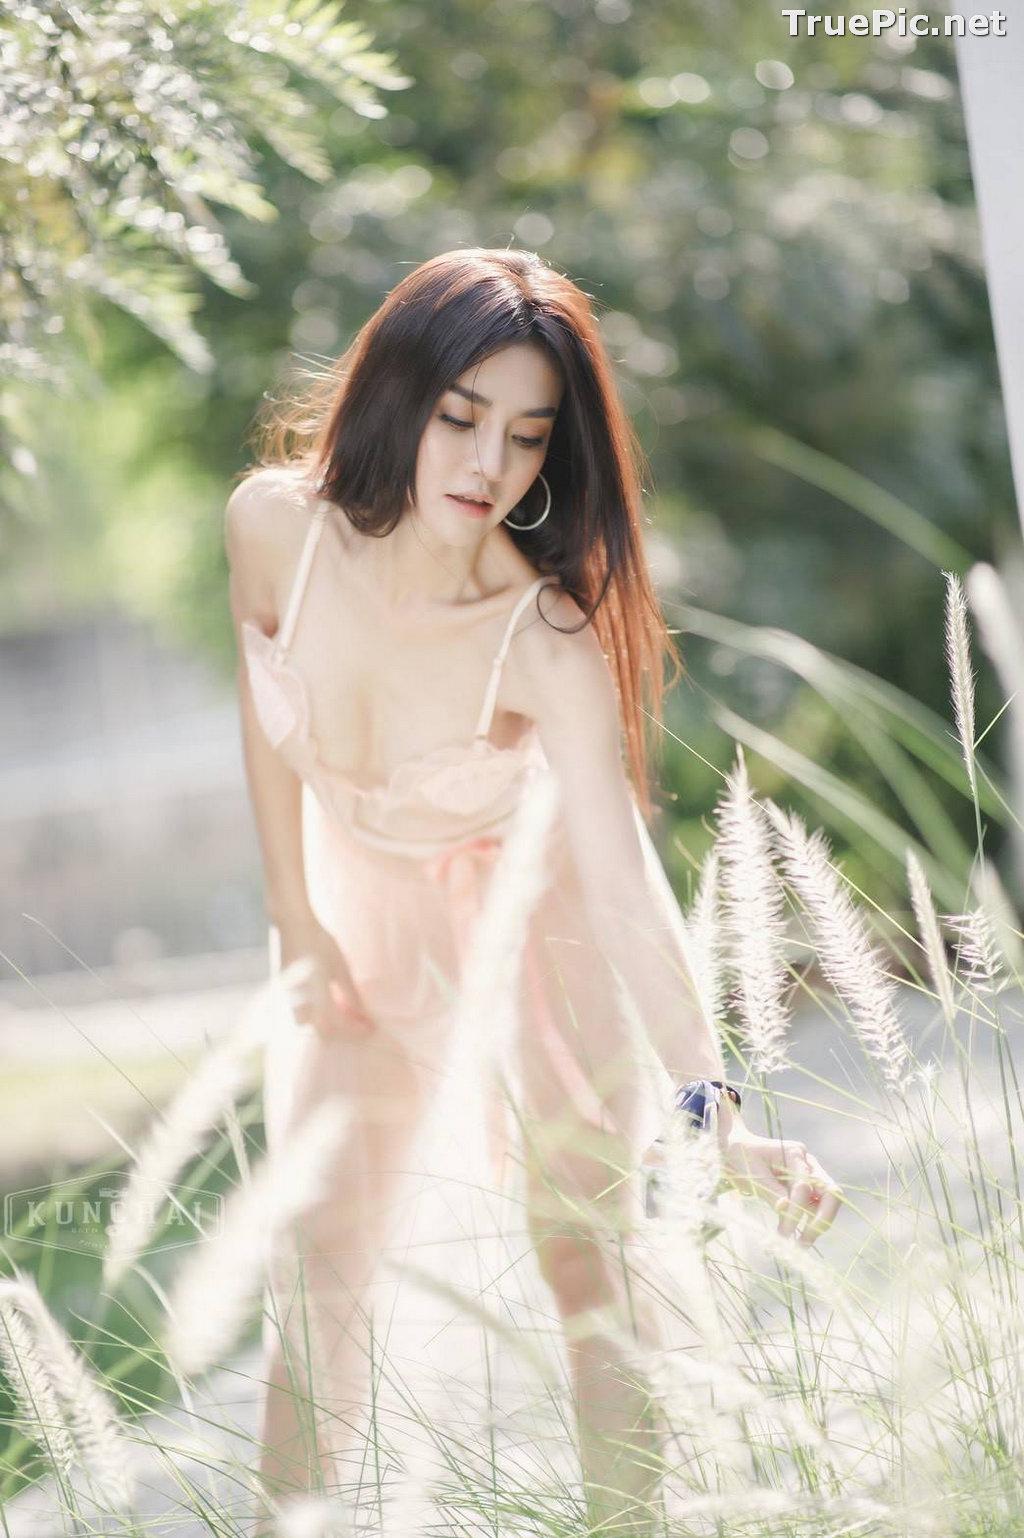 Image Thailand Model - ลฎาภา รัชตะอมรโชติ - Pink Transparent Lingerie - TruePic.net - Picture-2